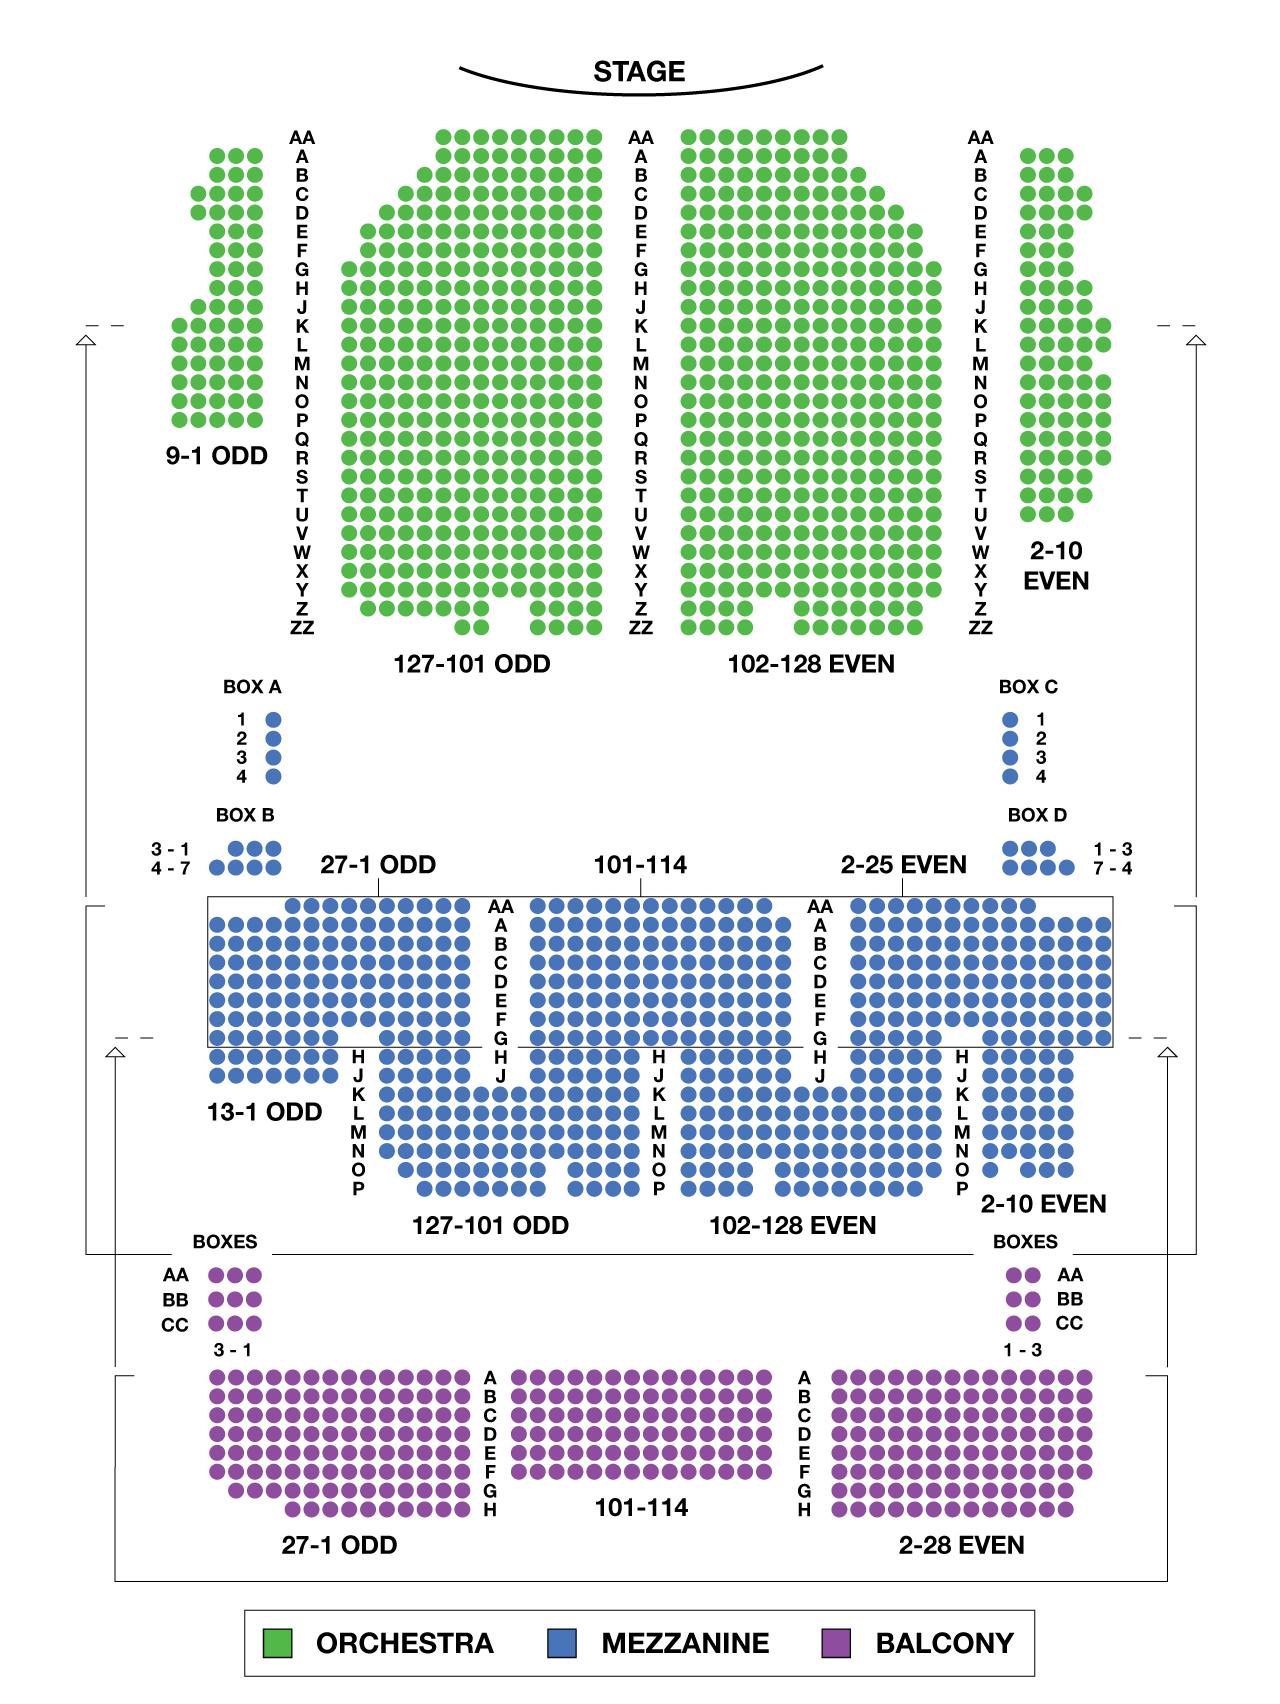 Louisville palace seating chart kendi charlasmotivacionales co